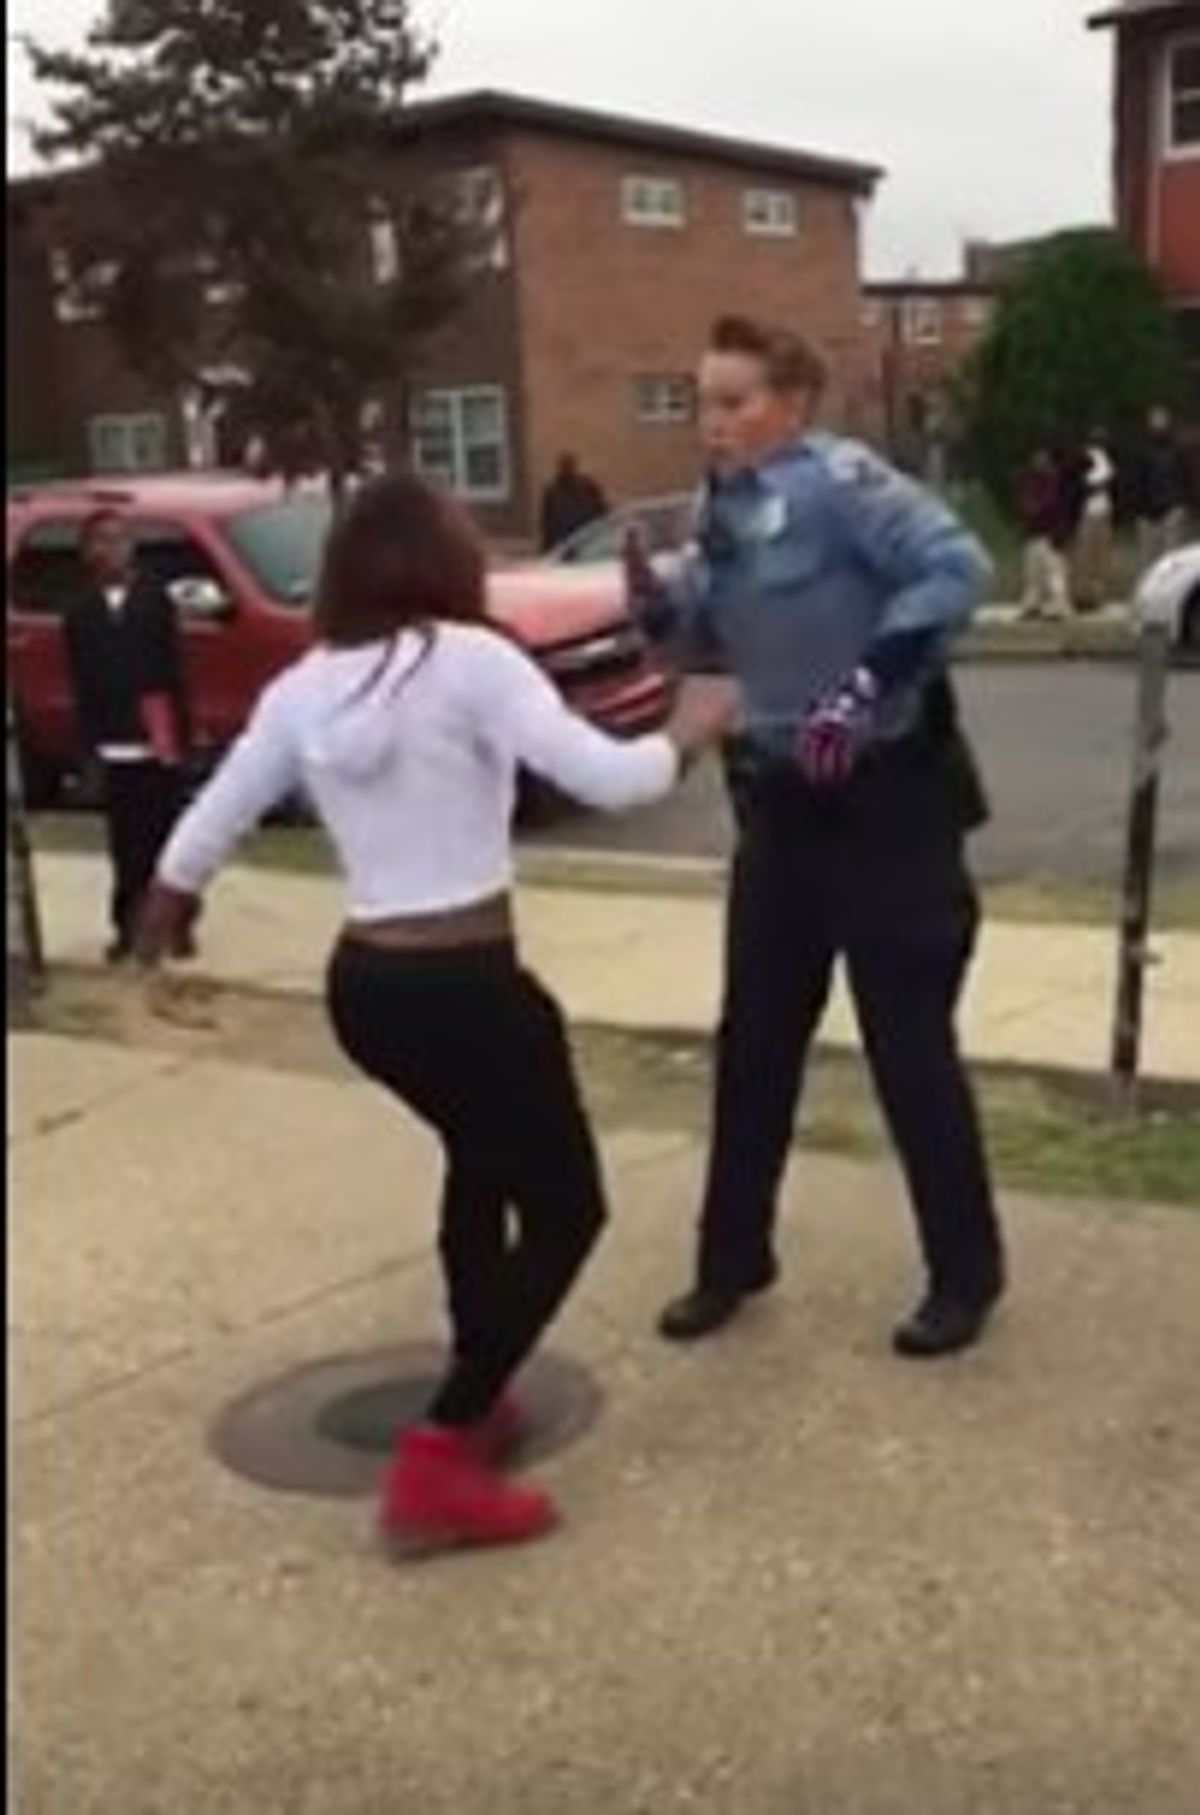 Cops Break Up Fights With Dancing Now